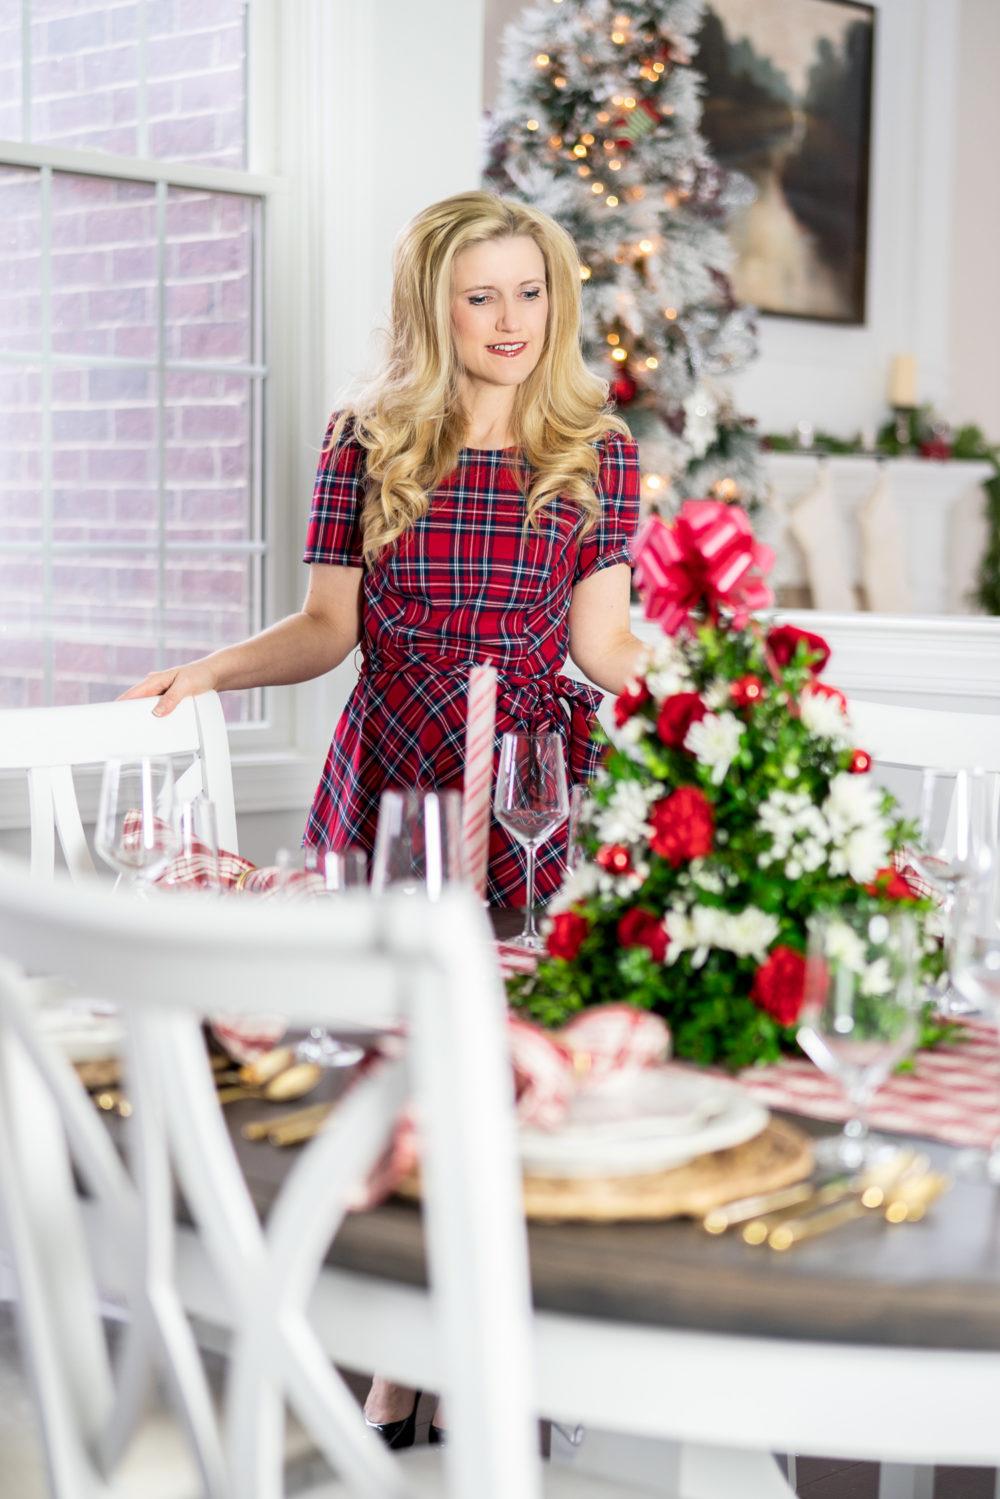 Petite Fashion Blog | Our Home for the Holidays | Christmas Decor | Flocked Christmas Tree | White Kitchen- | Juliska Berry and Thread | Juliska Holiday Dinnerware | FTD Flowers | Christmas Flowers